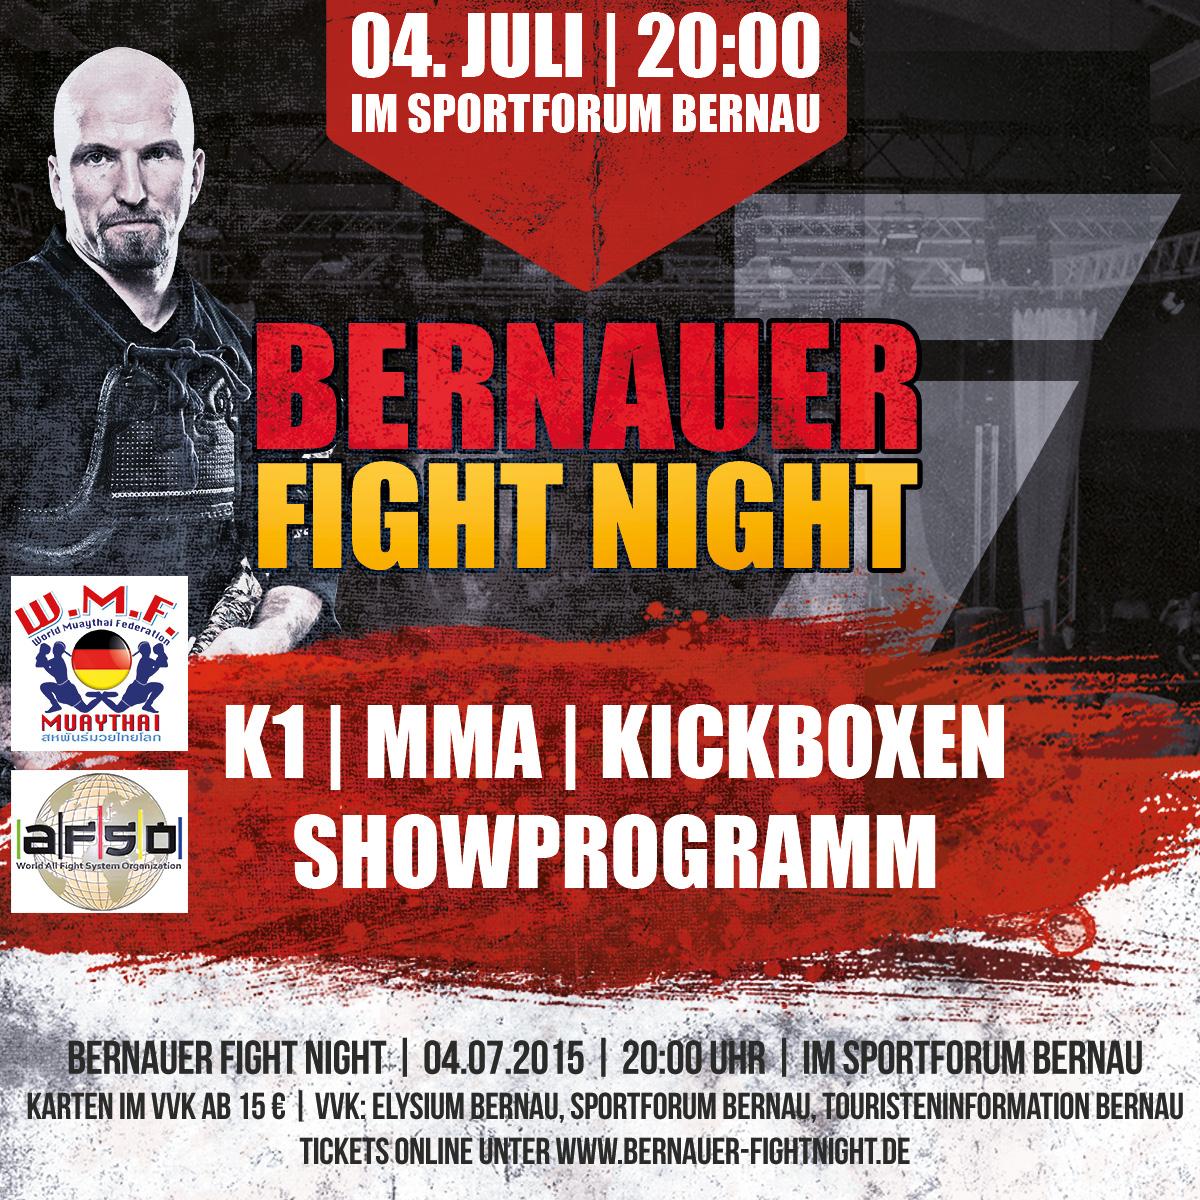 Photo of Bernauer Fight Night: Ring frei zur 7. Runde am 04. Juli